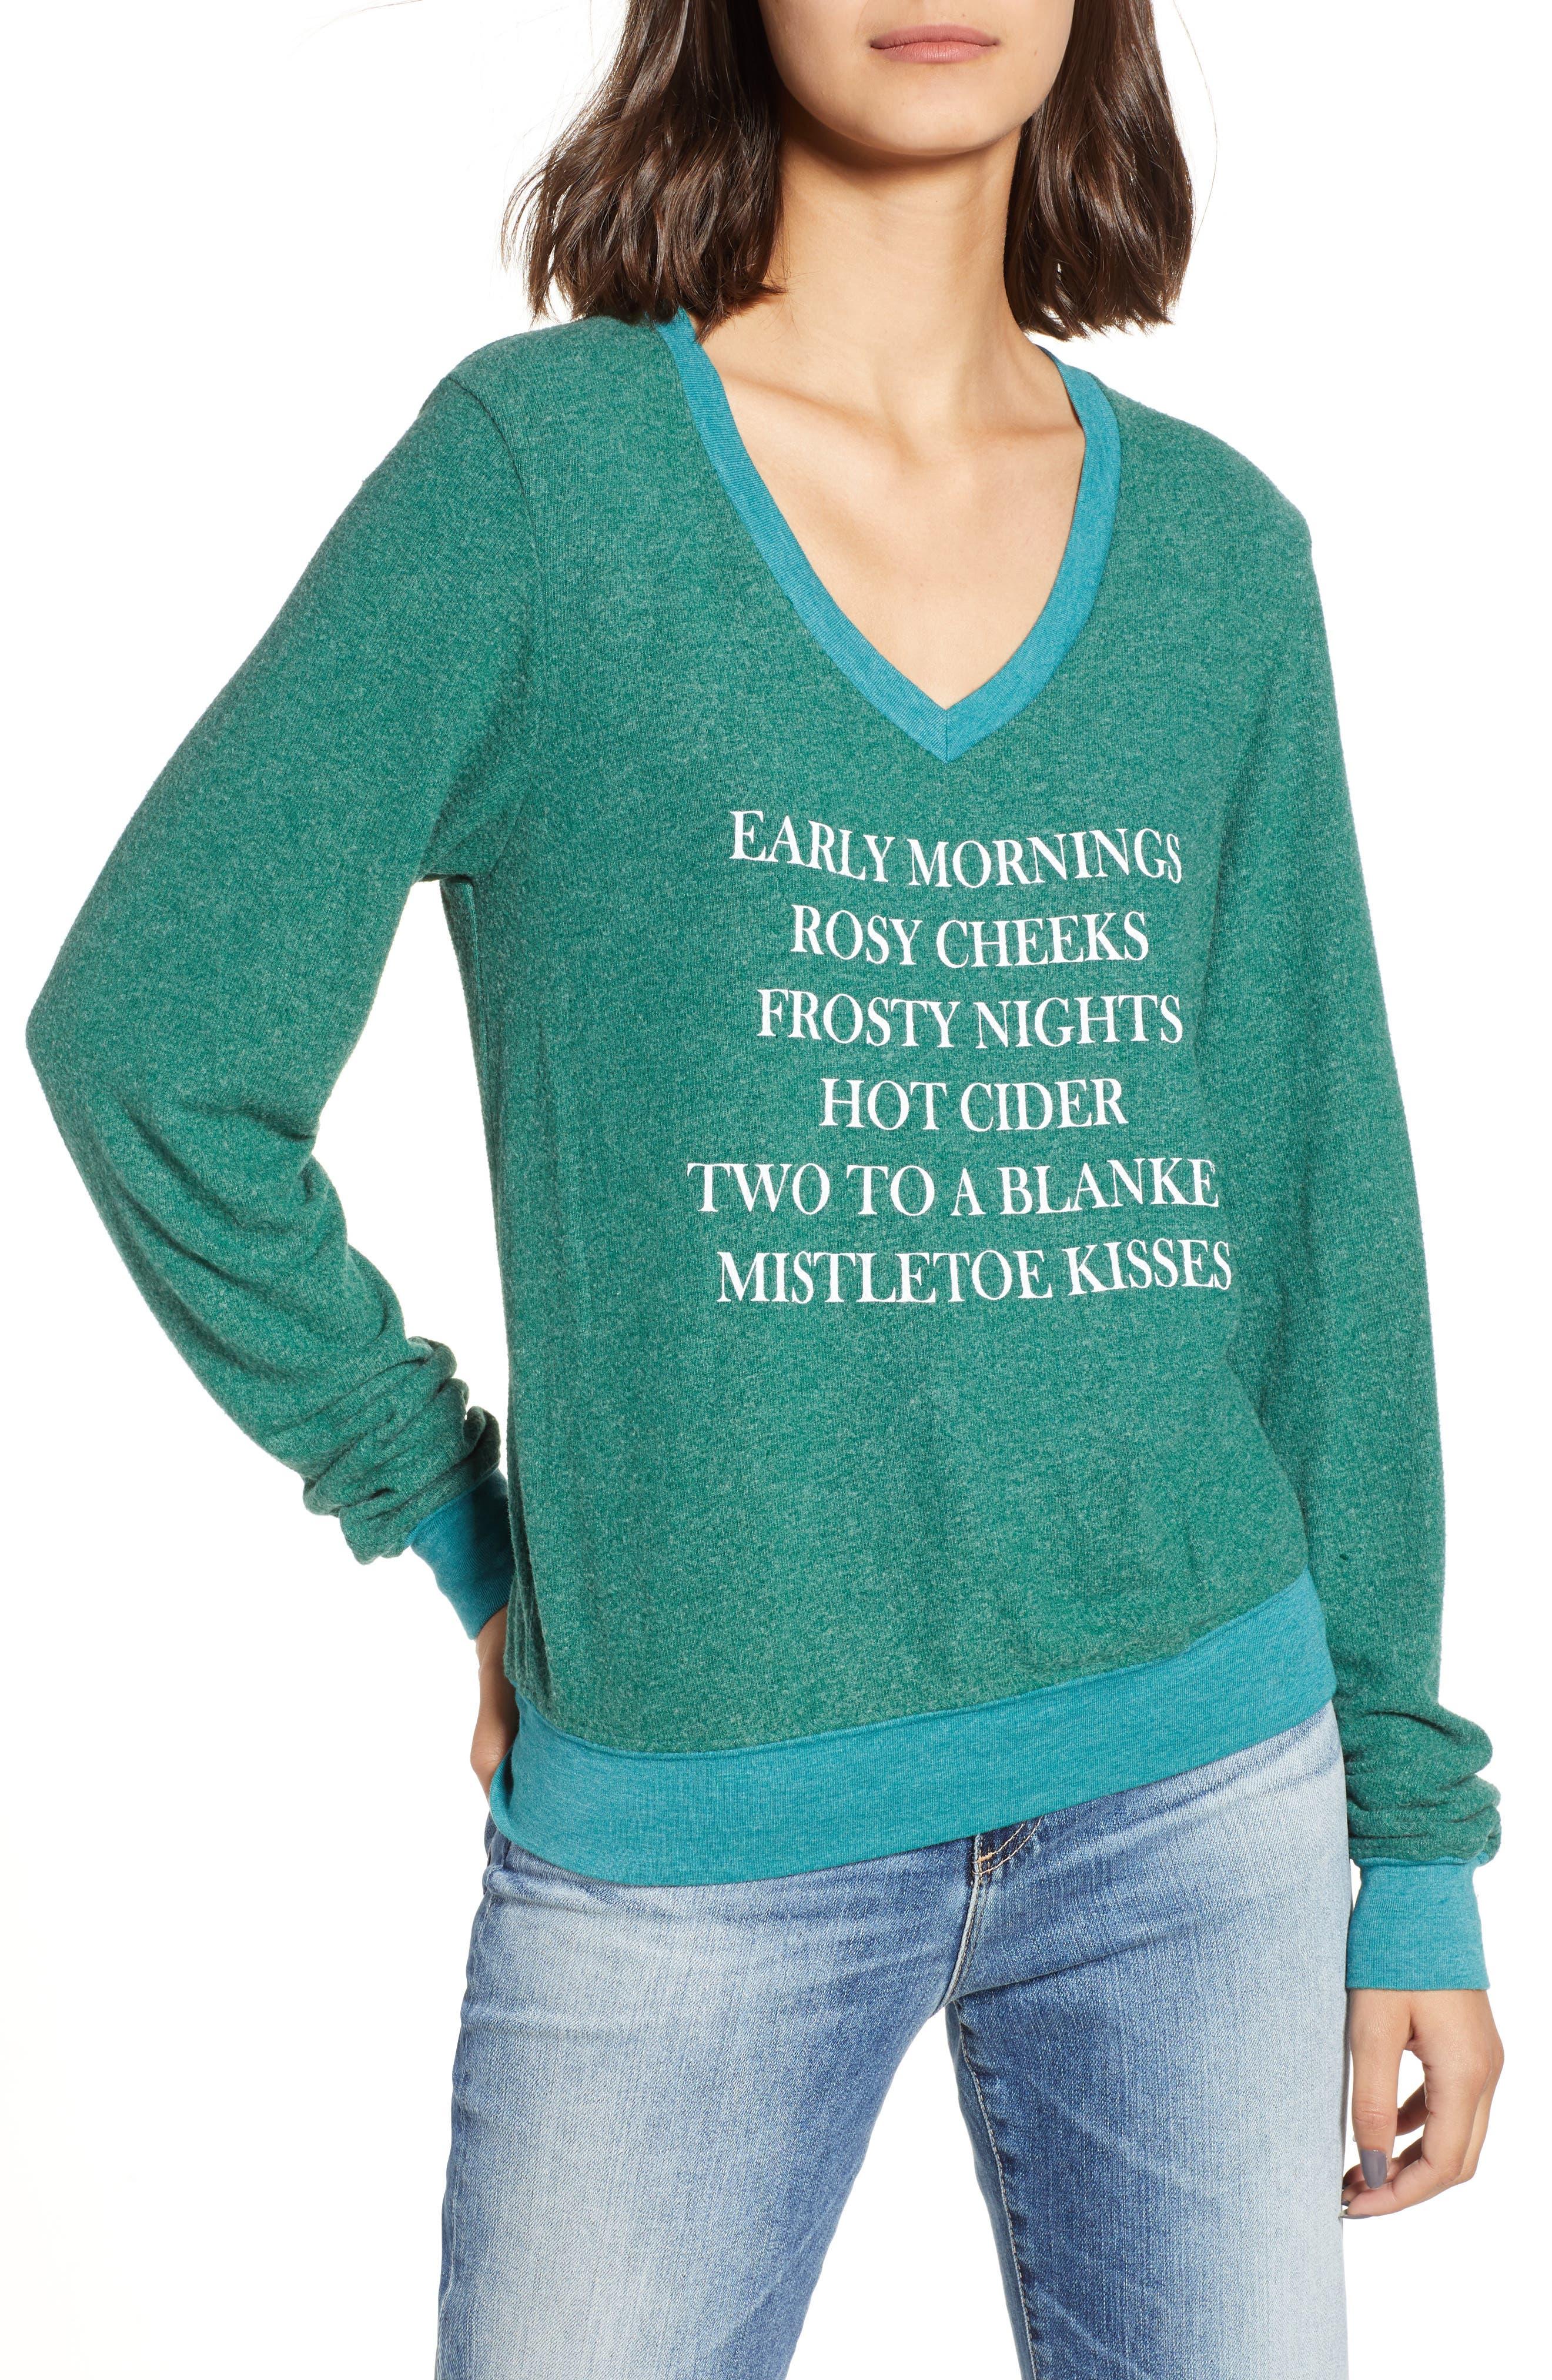 Mistletoe Kisses Sweater,                             Main thumbnail 1, color,                             WOODFALL GREEN